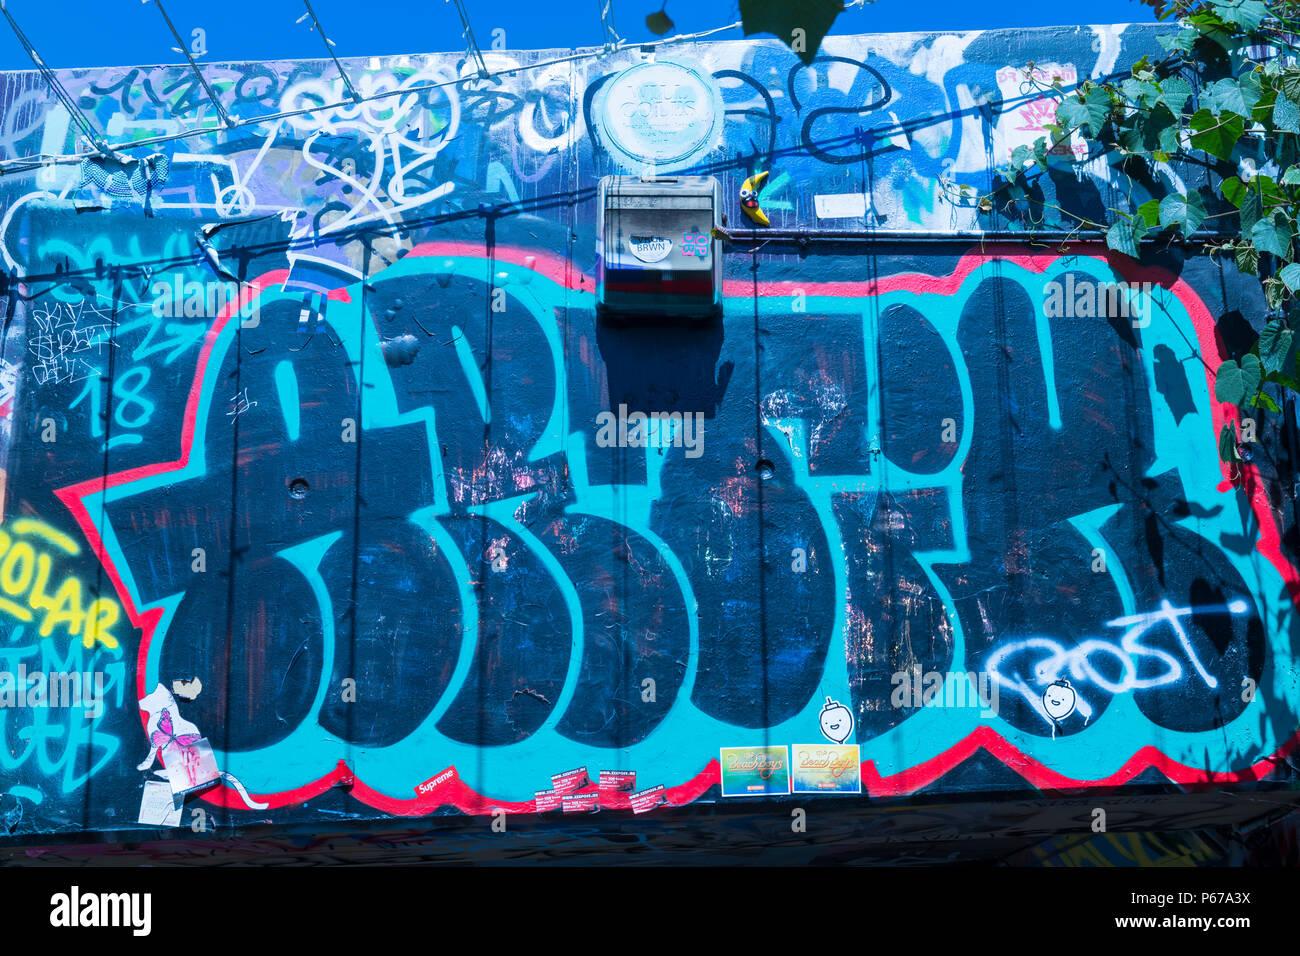 London Waterloo Leake Street graffiti de luz azul oscuro letras script pavimento pared detalles acera Arthur blue sky deja Imagen De Stock